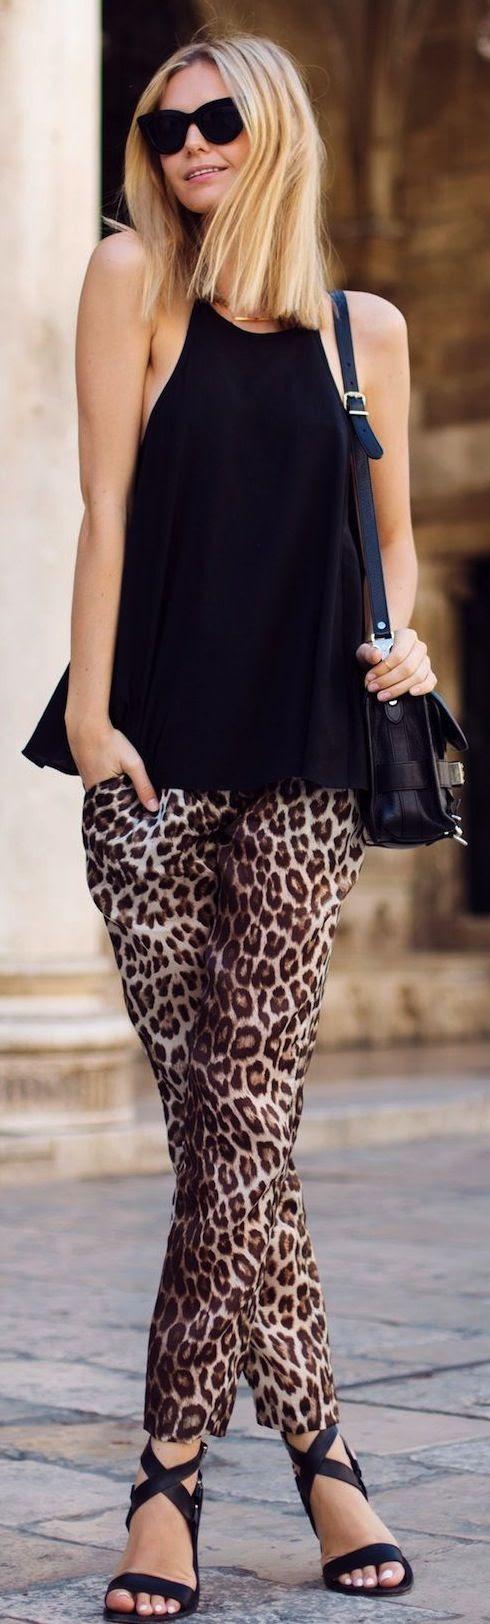 Jackolivia's Fashion Blog: Jessica Stein